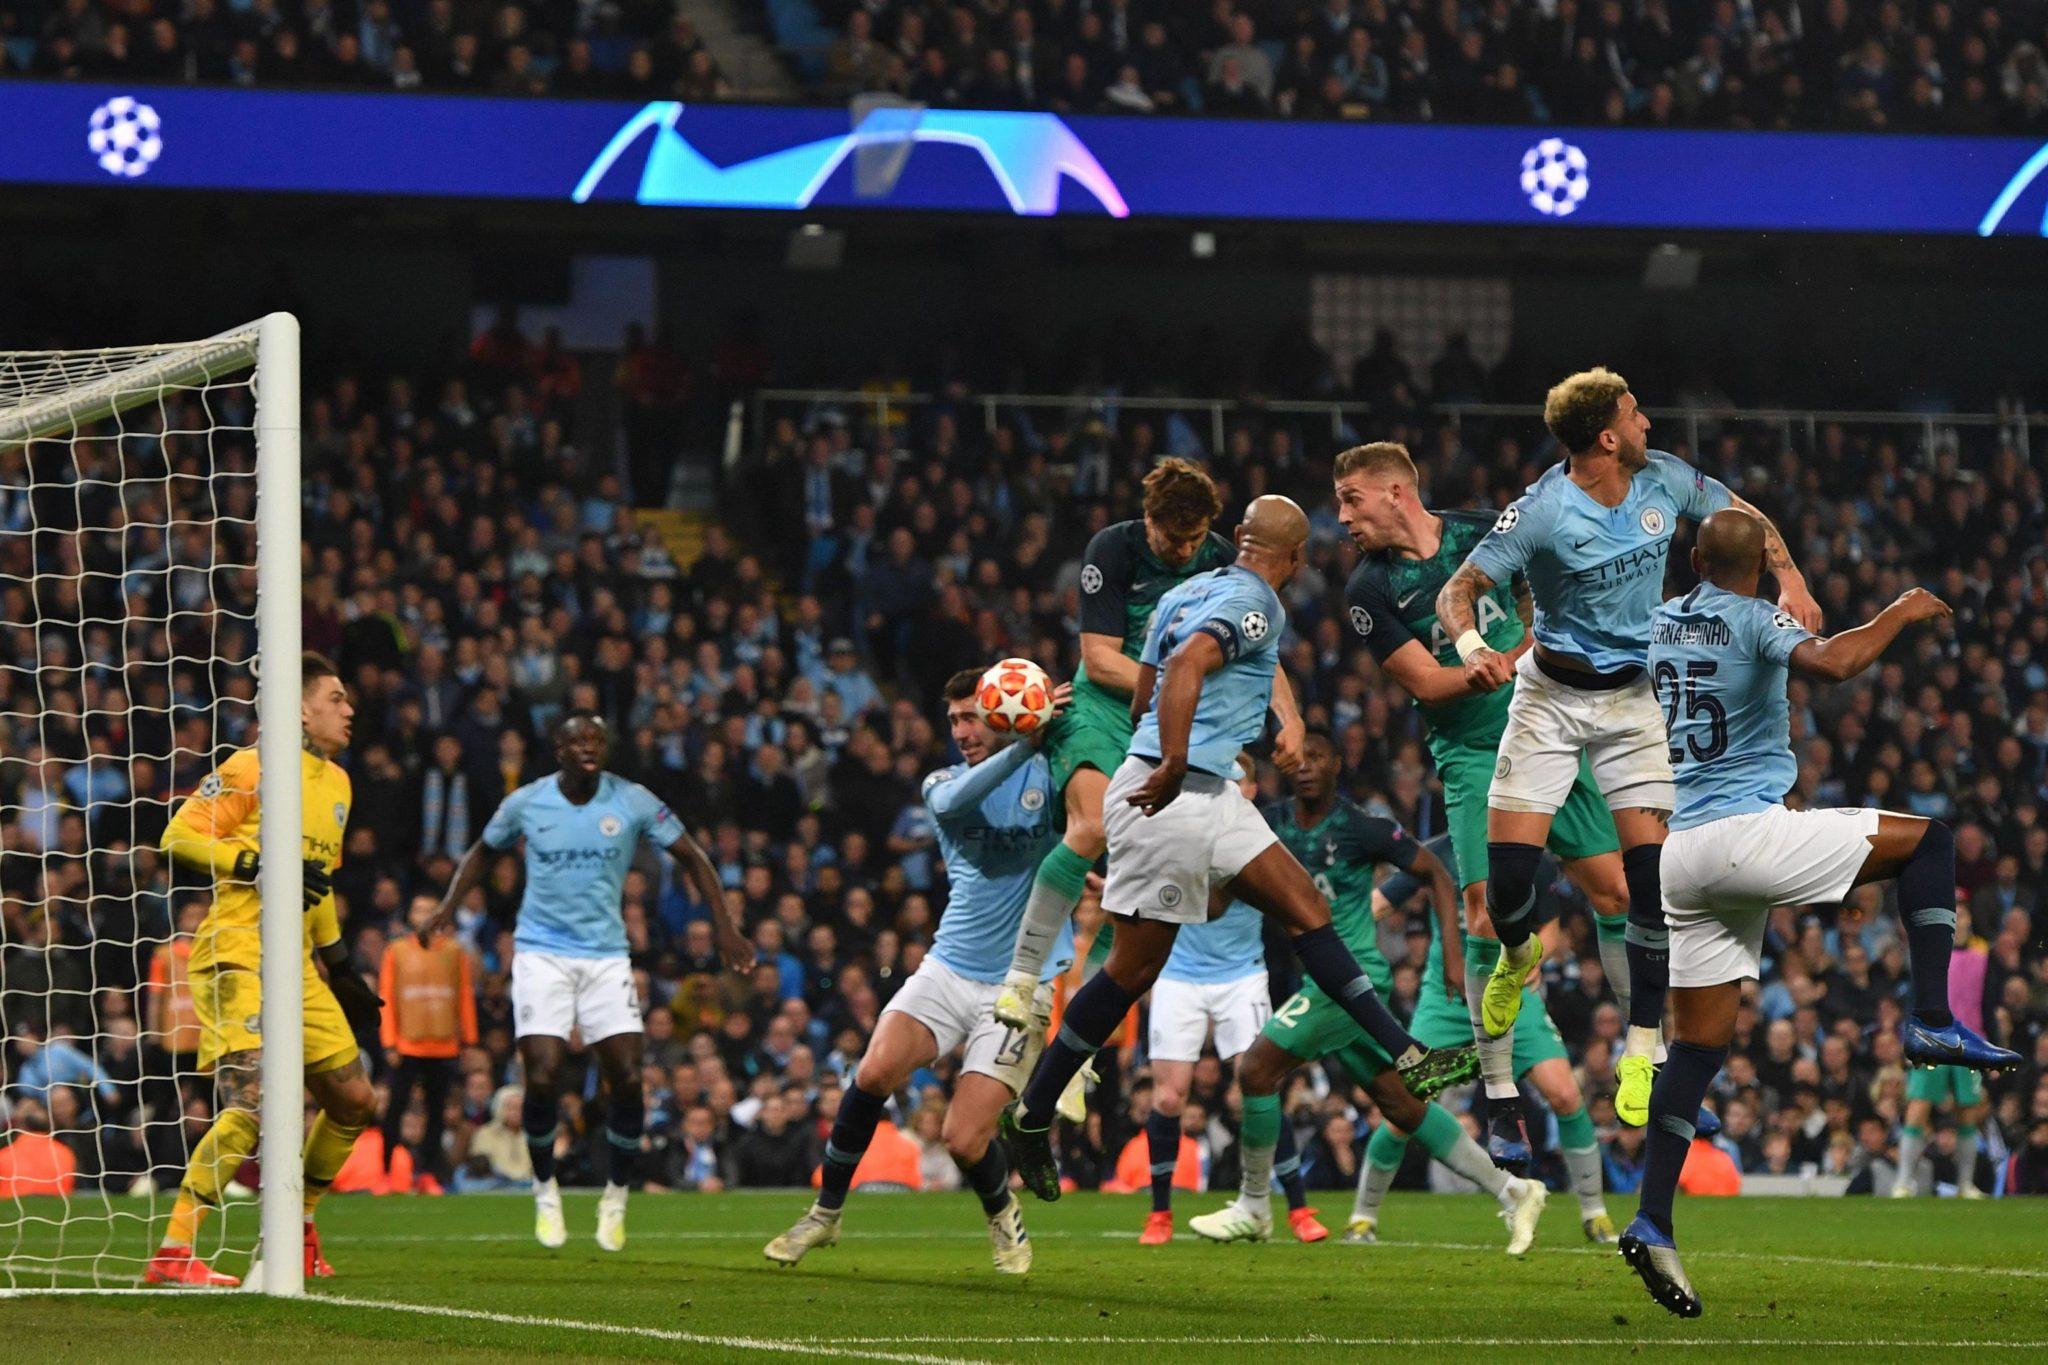 прогноз на 25.04.2021. «Тоттенхэм» — «Манчестер Сити»